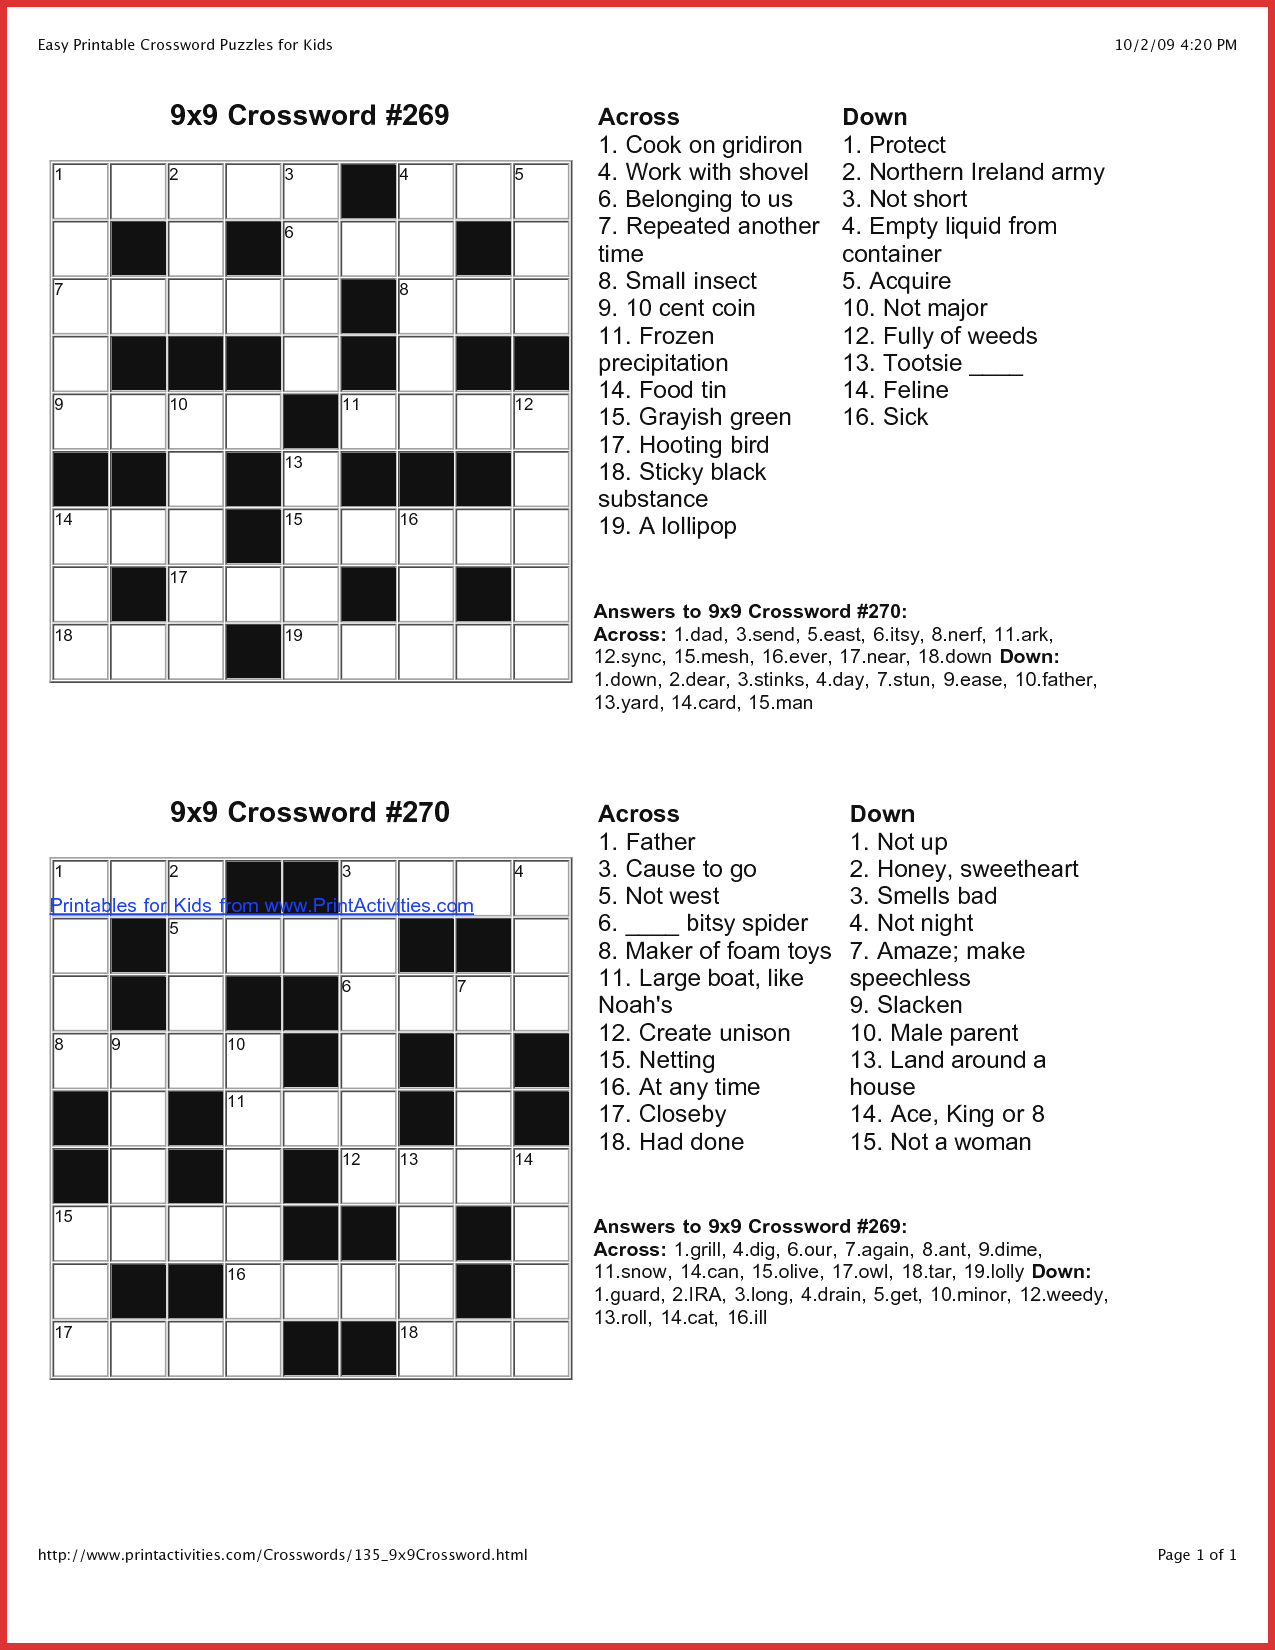 Luxury Puzzles To Print | Cobble Usa - Free Online Printable Easy Crossword Puzzles